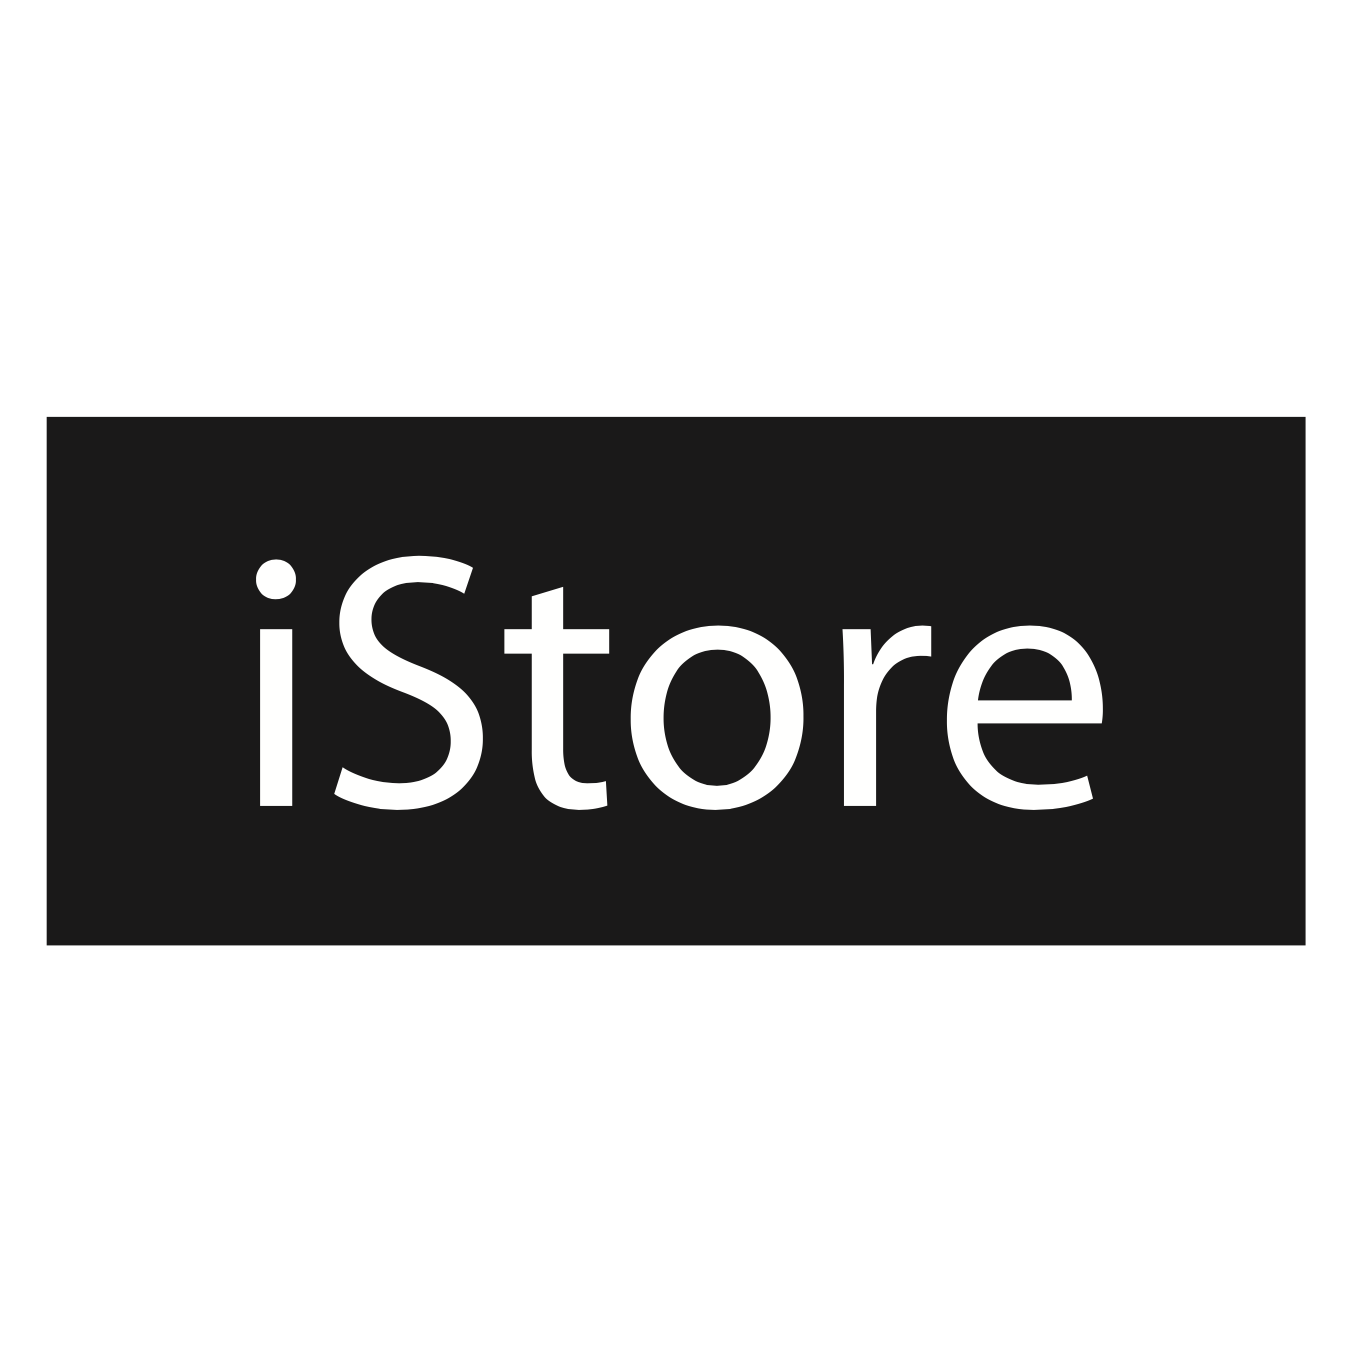 iPhone 11 Pro Max Silicone Case - Clementine (Orange)